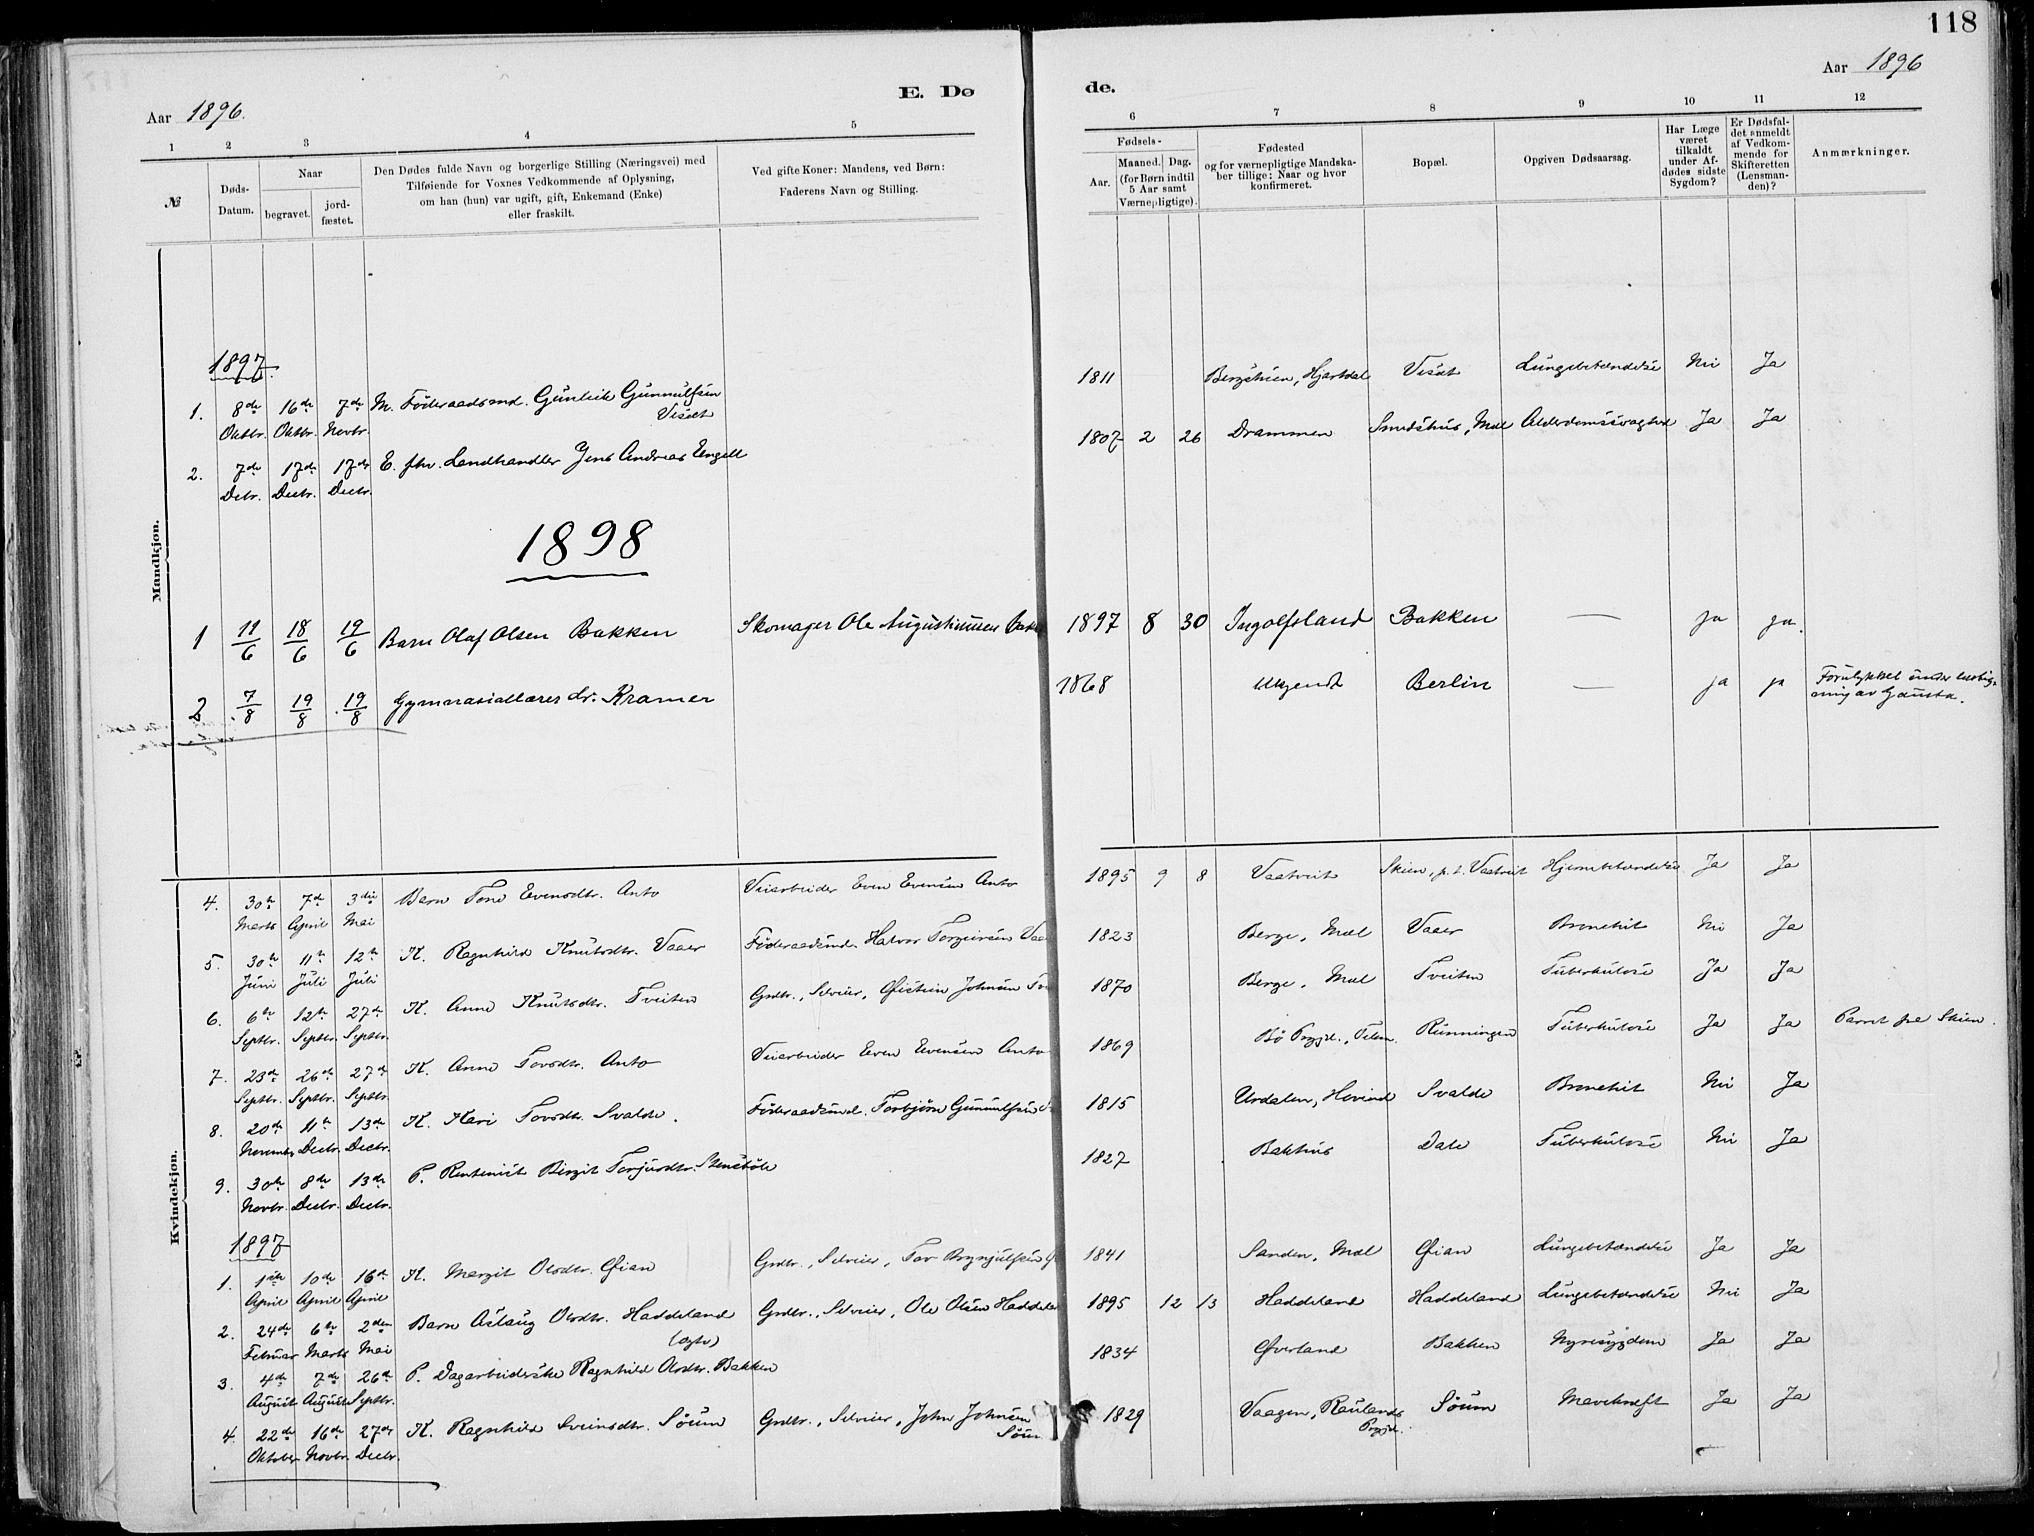 SAKO, Rjukan kirkebøker, F/Fa/L0001: Ministerialbok nr. 1, 1878-1912, s. 118